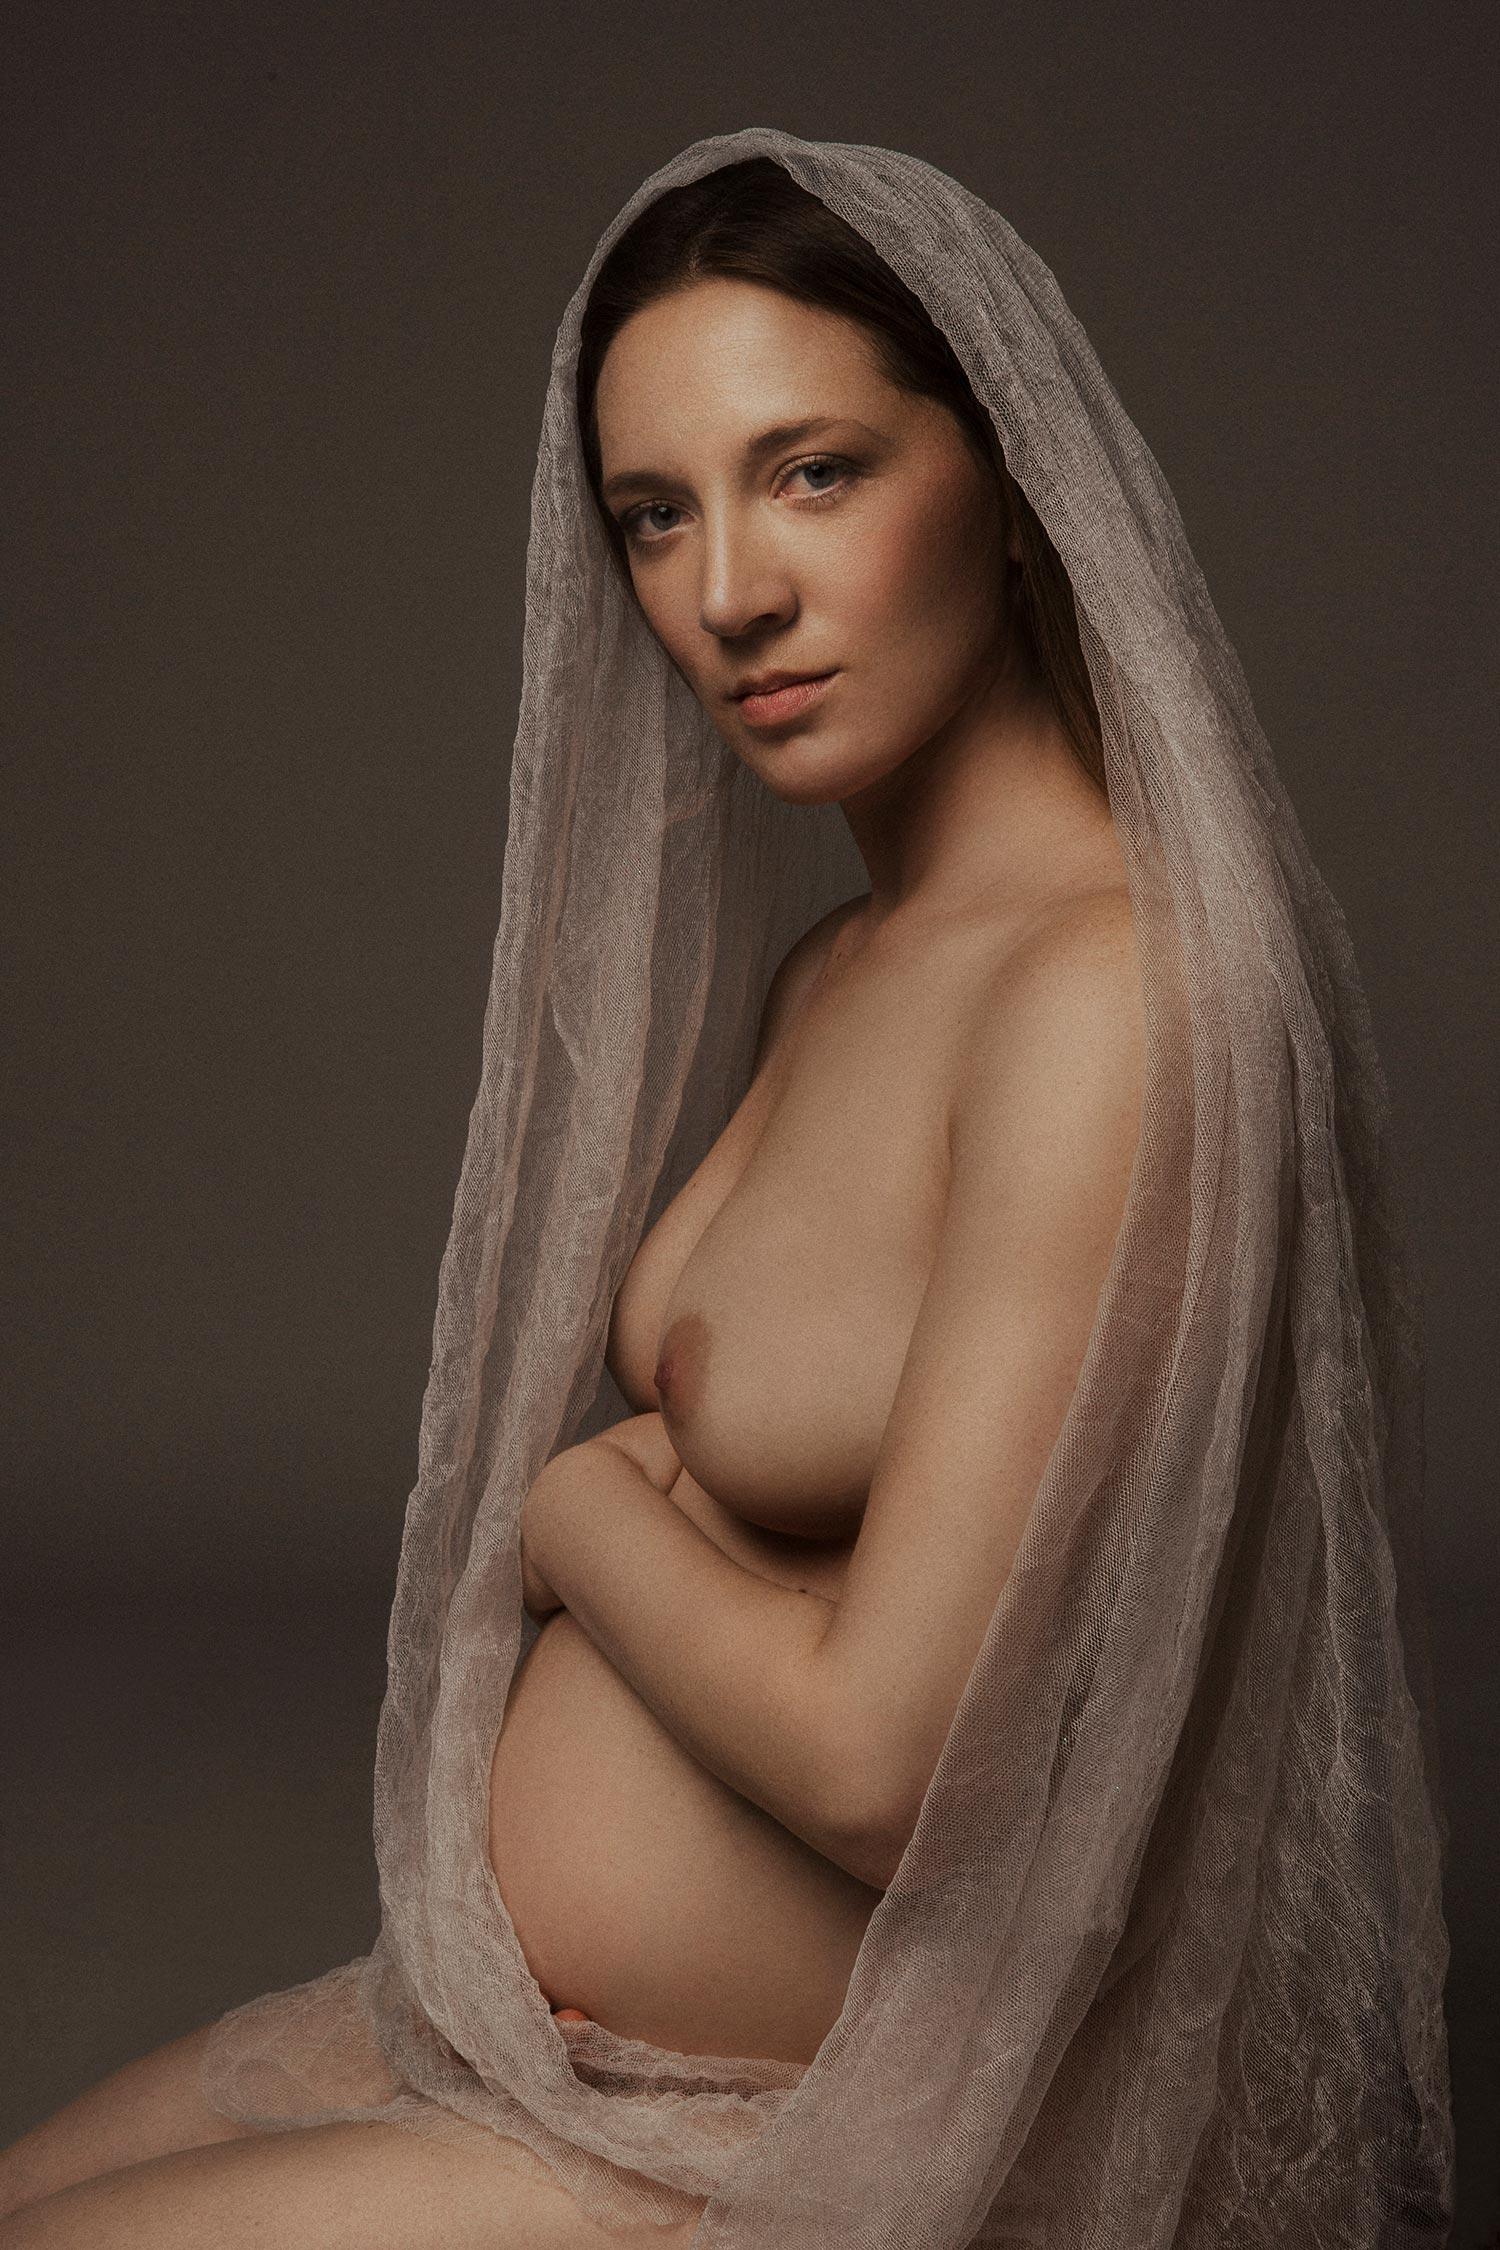 Maternity-Photographer-Thuy-Vo-11.jpg